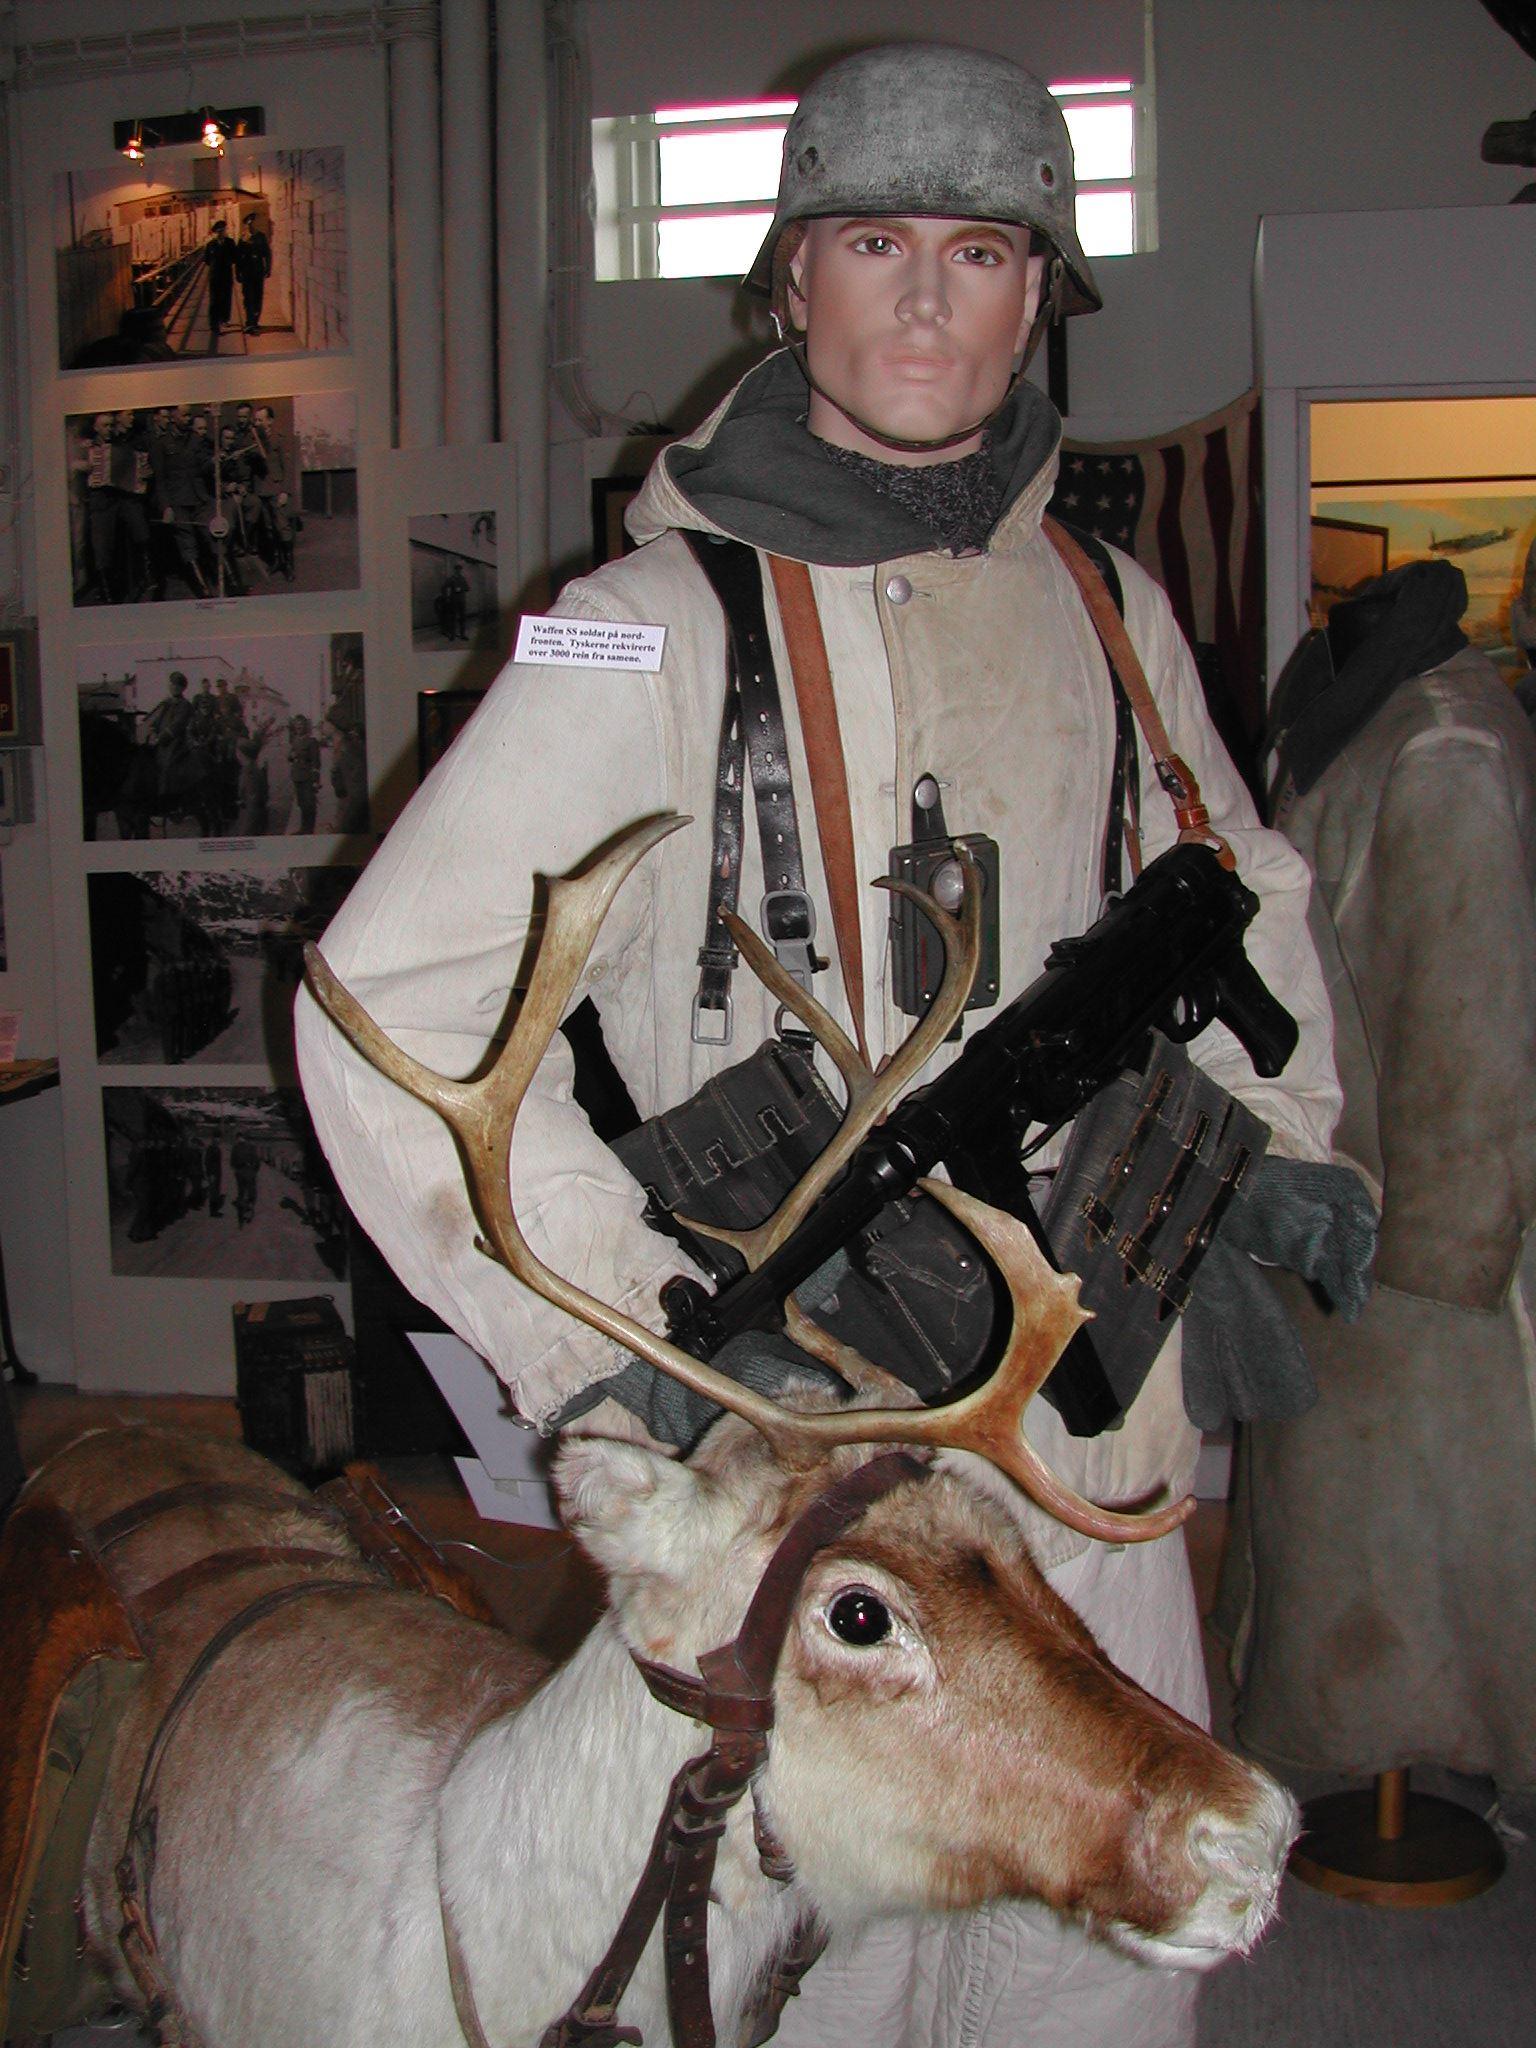 © Lofoten Krigsminnemuseum, Lofoten Krigsminnemuseum